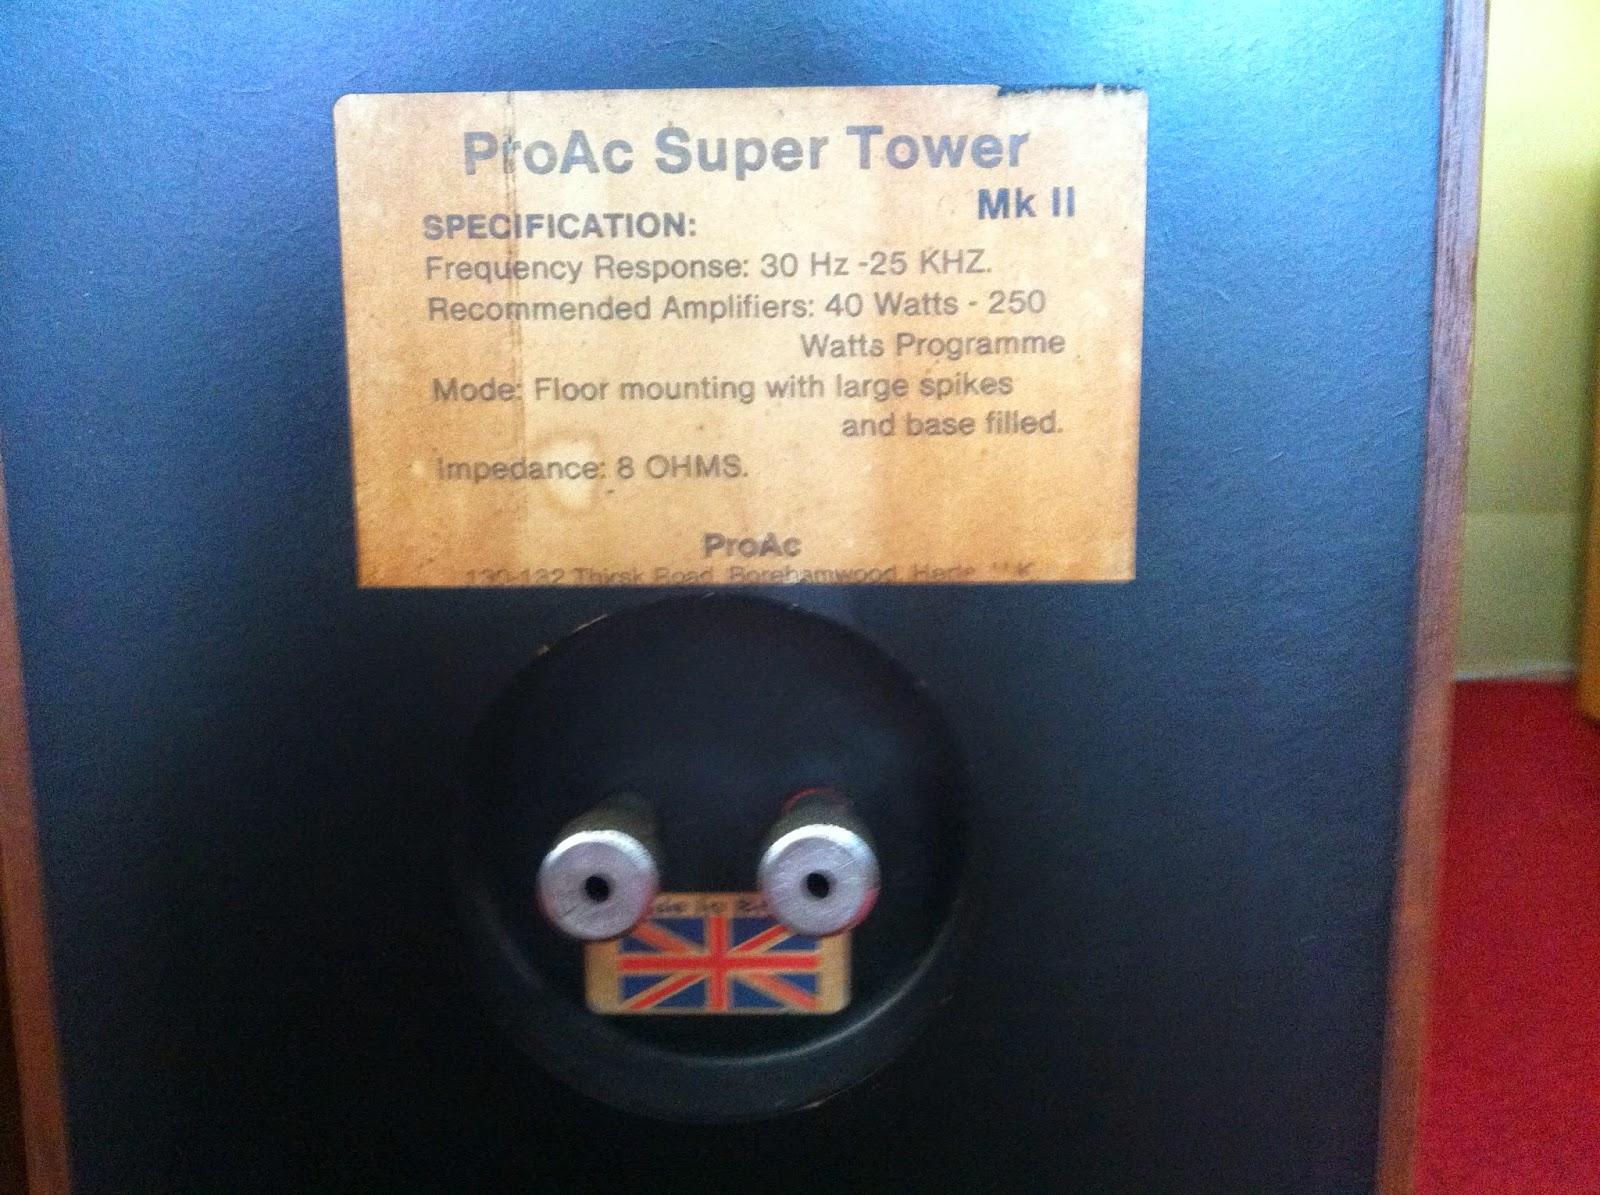 Cầu loa ProAC Super Tower Mk II